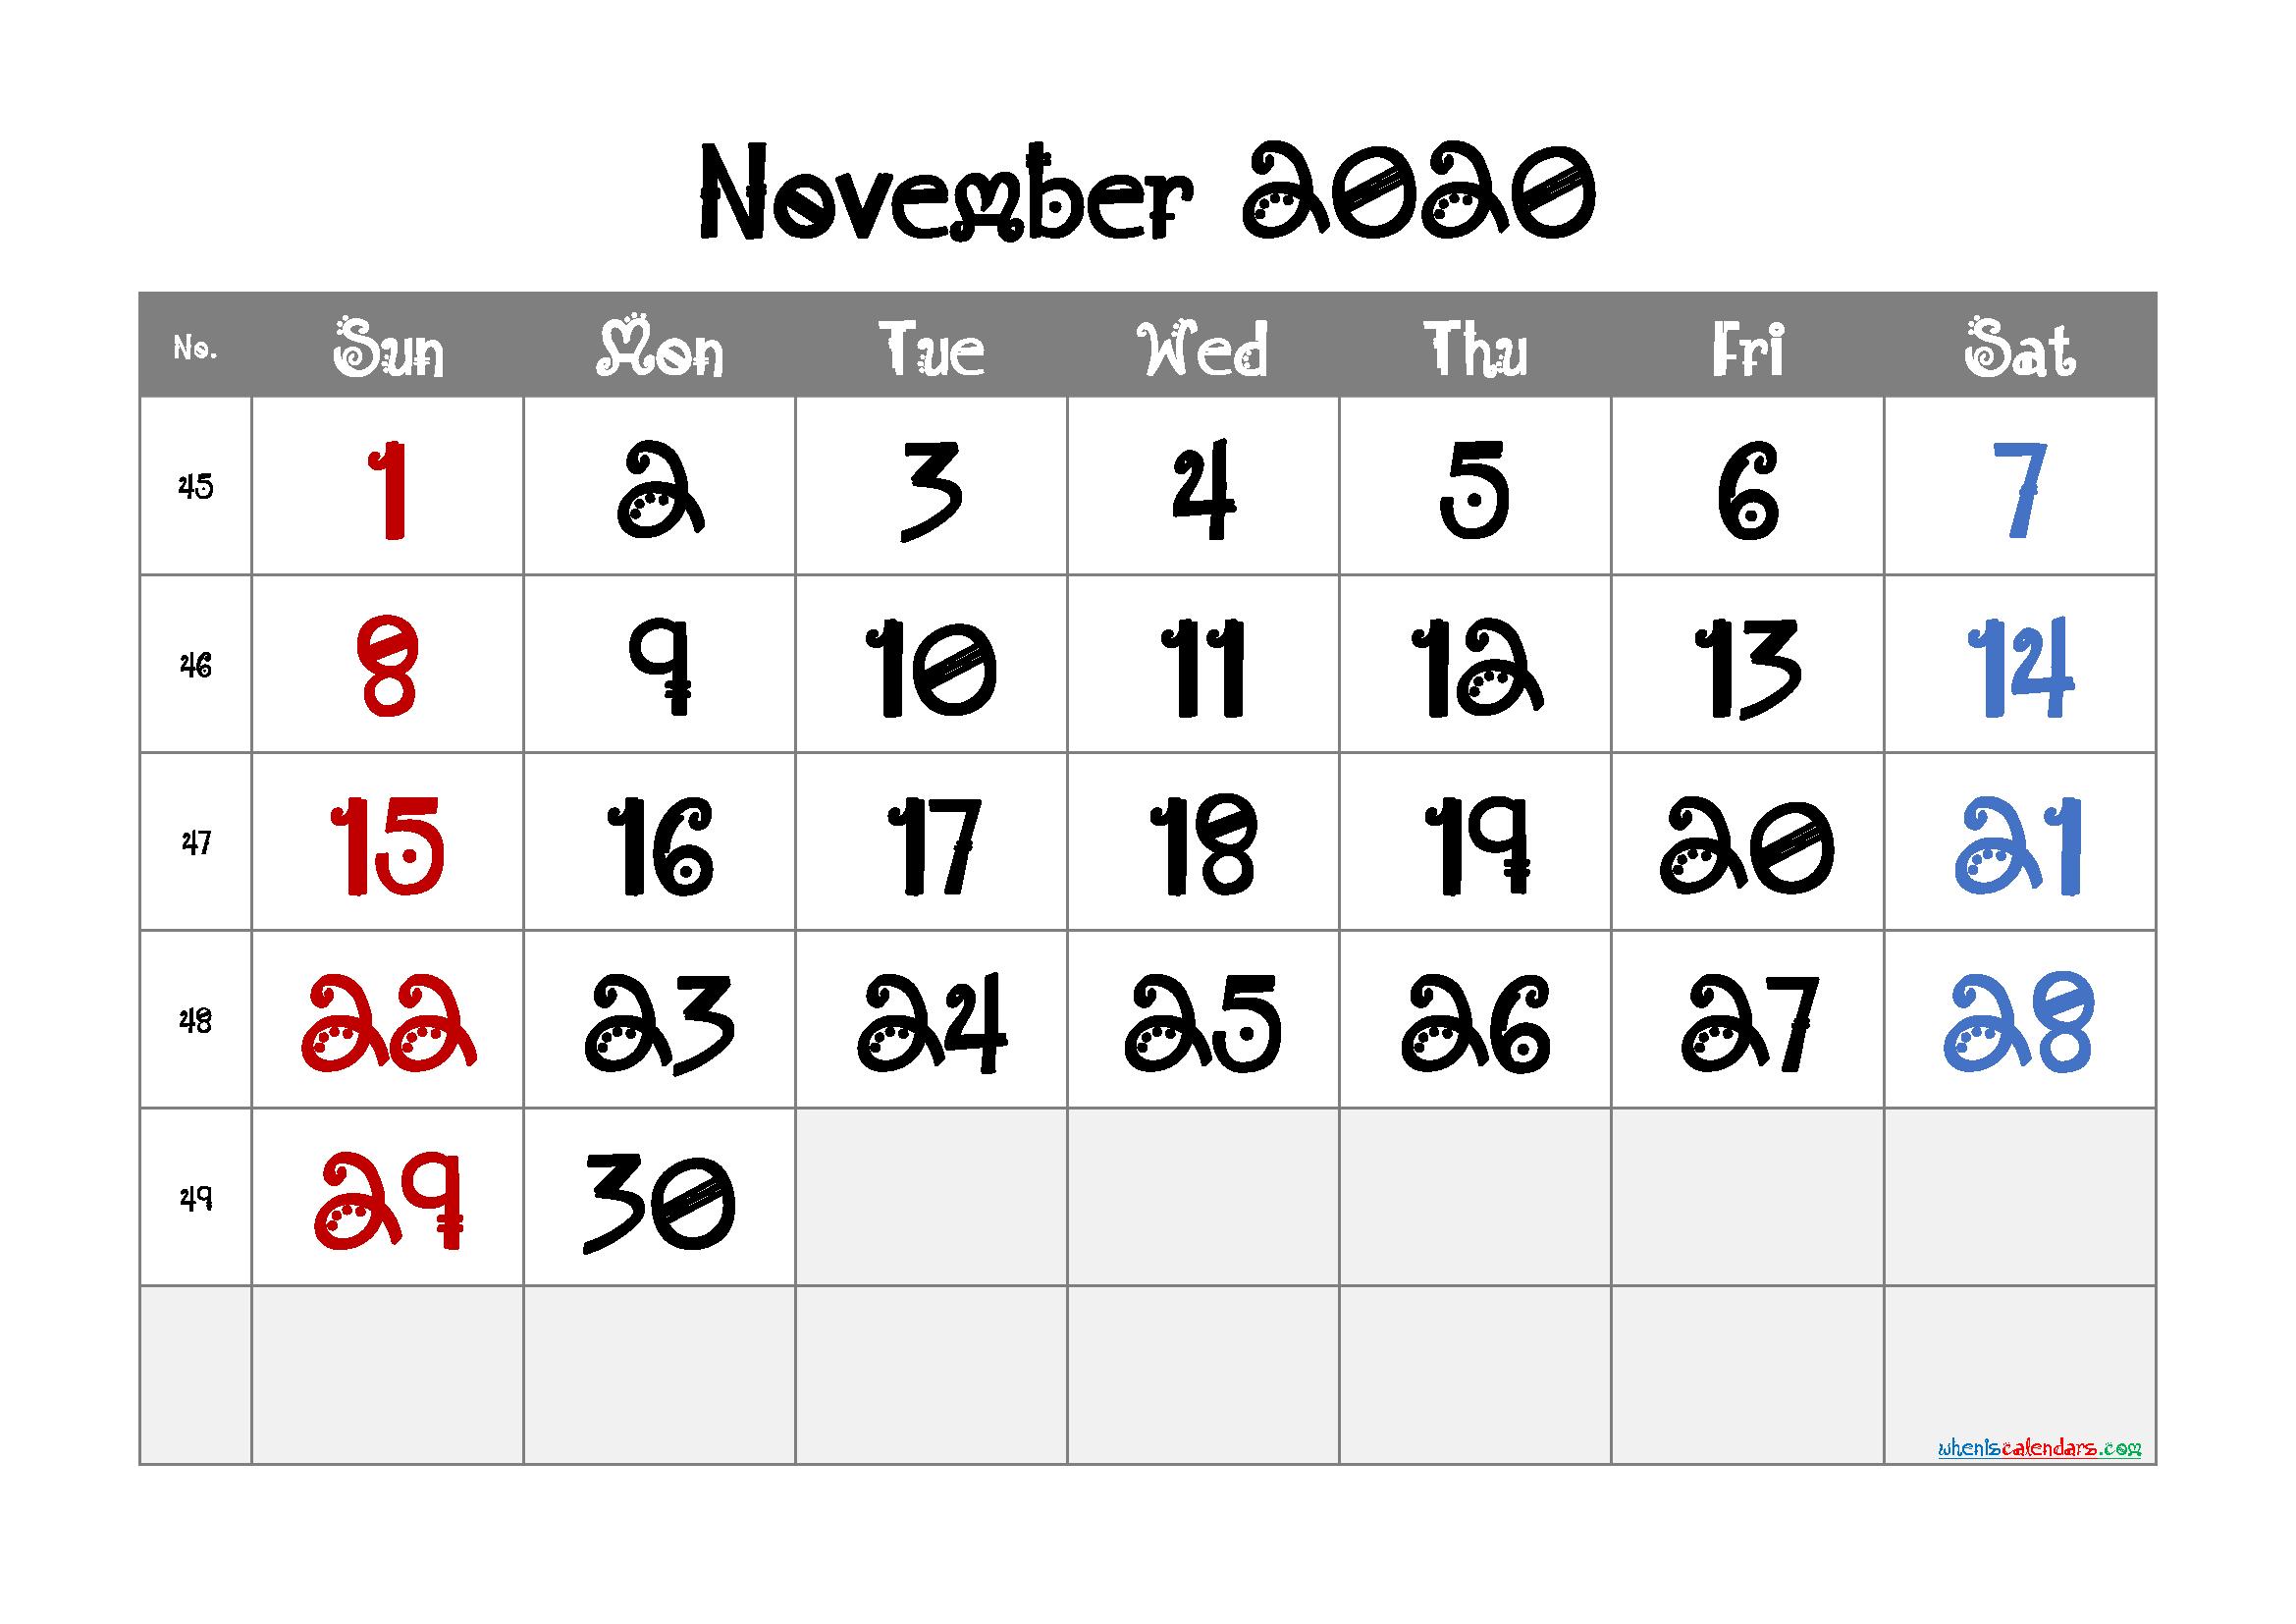 November 2020 Printable Calendar Free